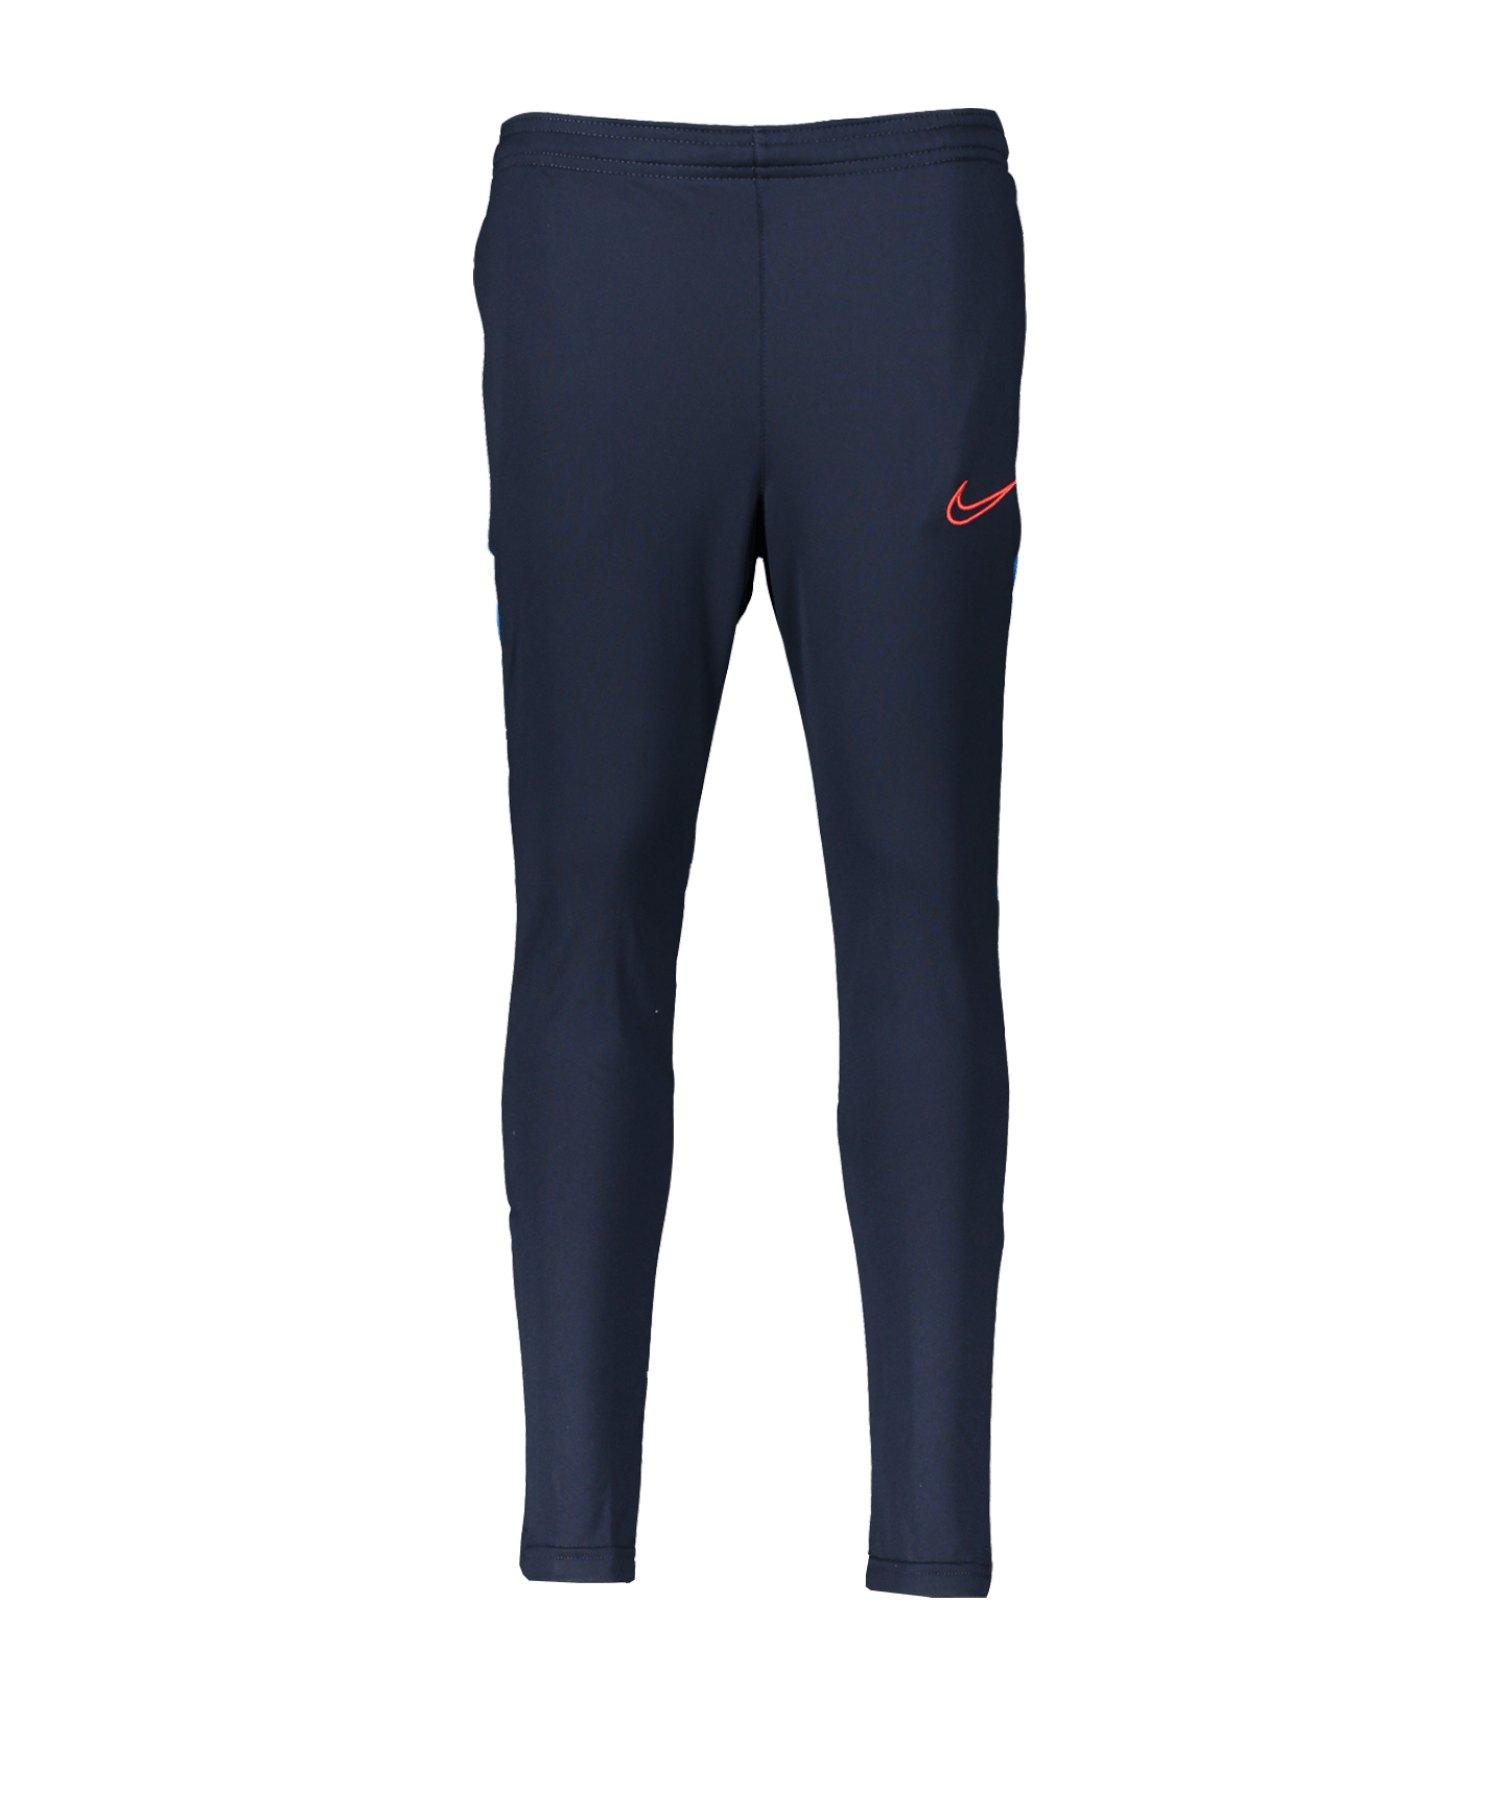 Nike Dry Academy Pant Jogginghose Kids Blau F453 - blau